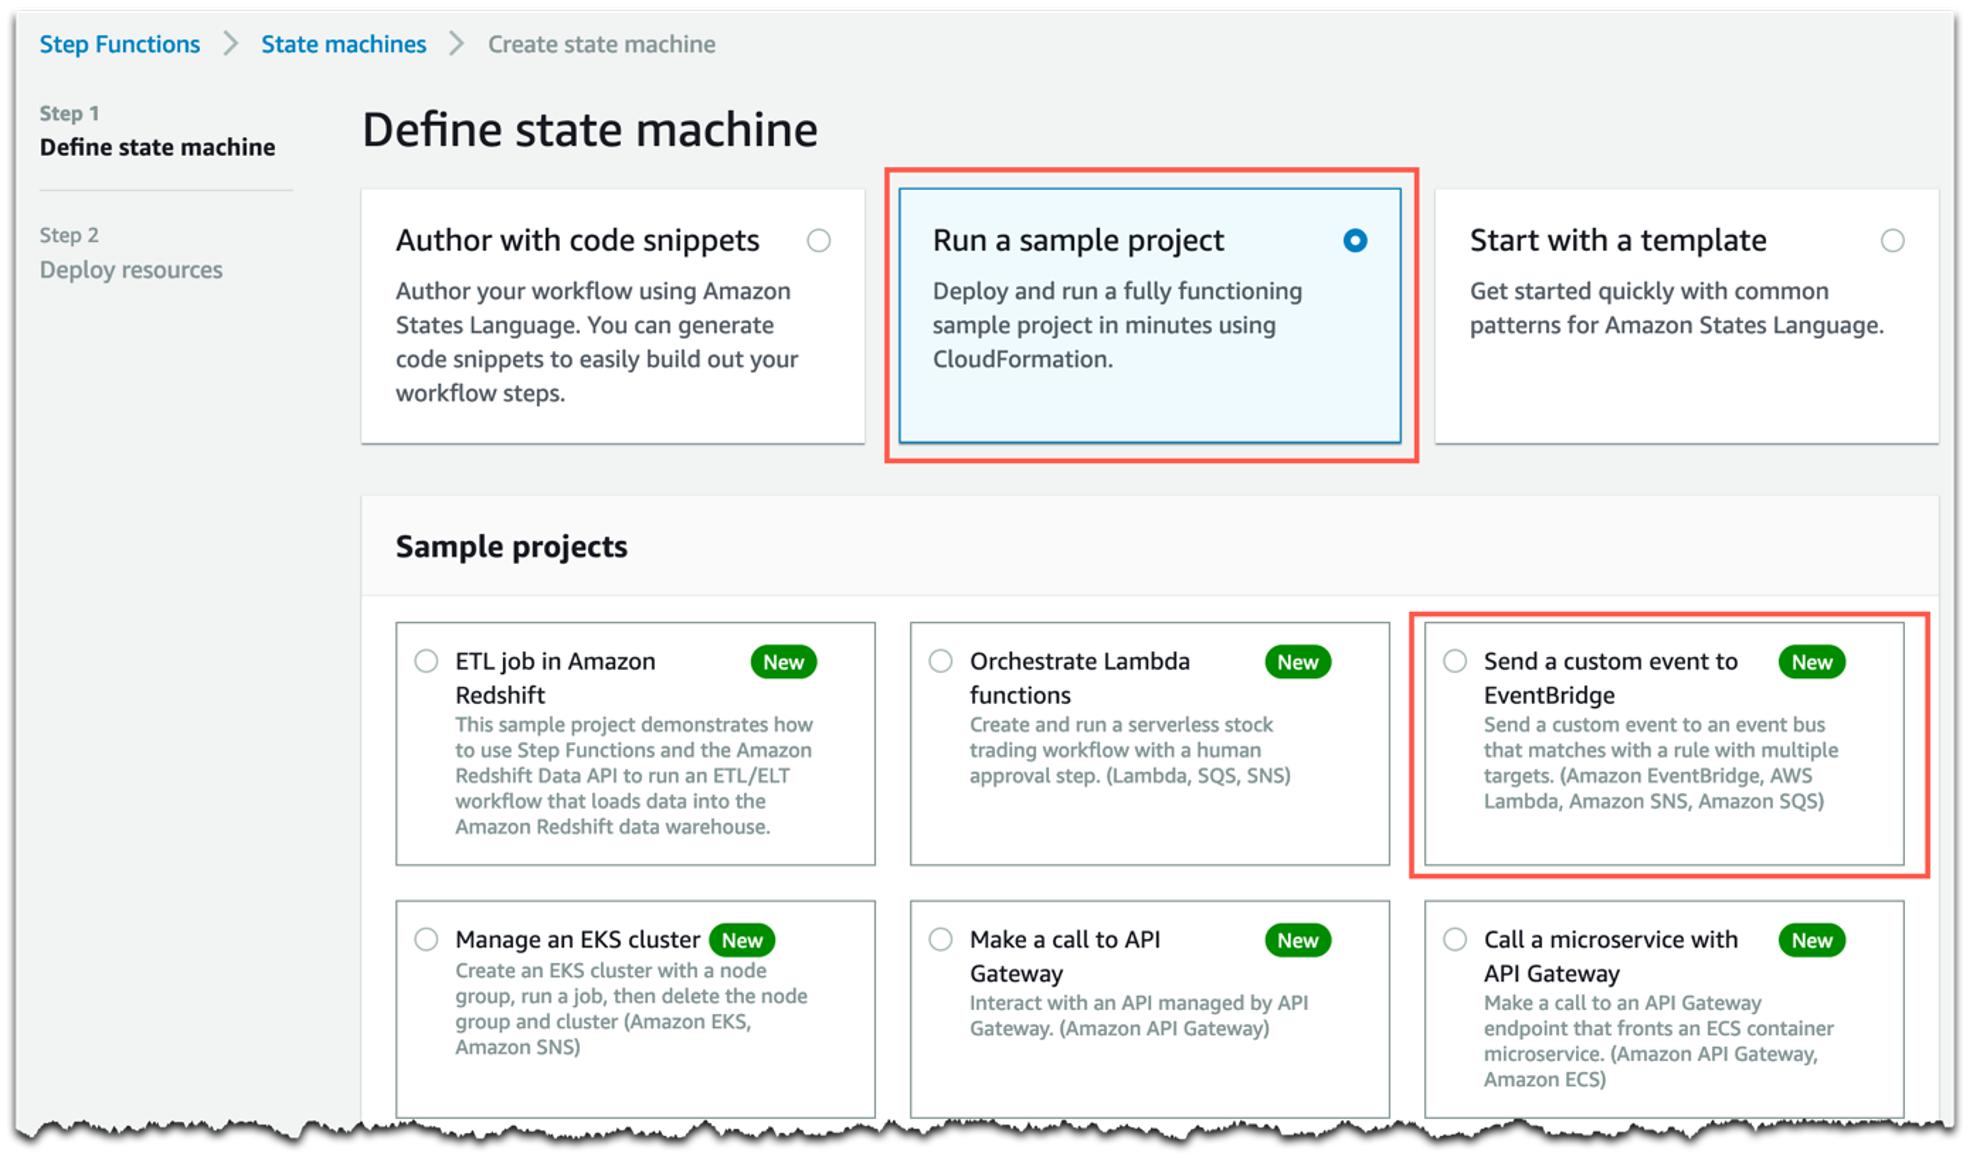 Run a sample project